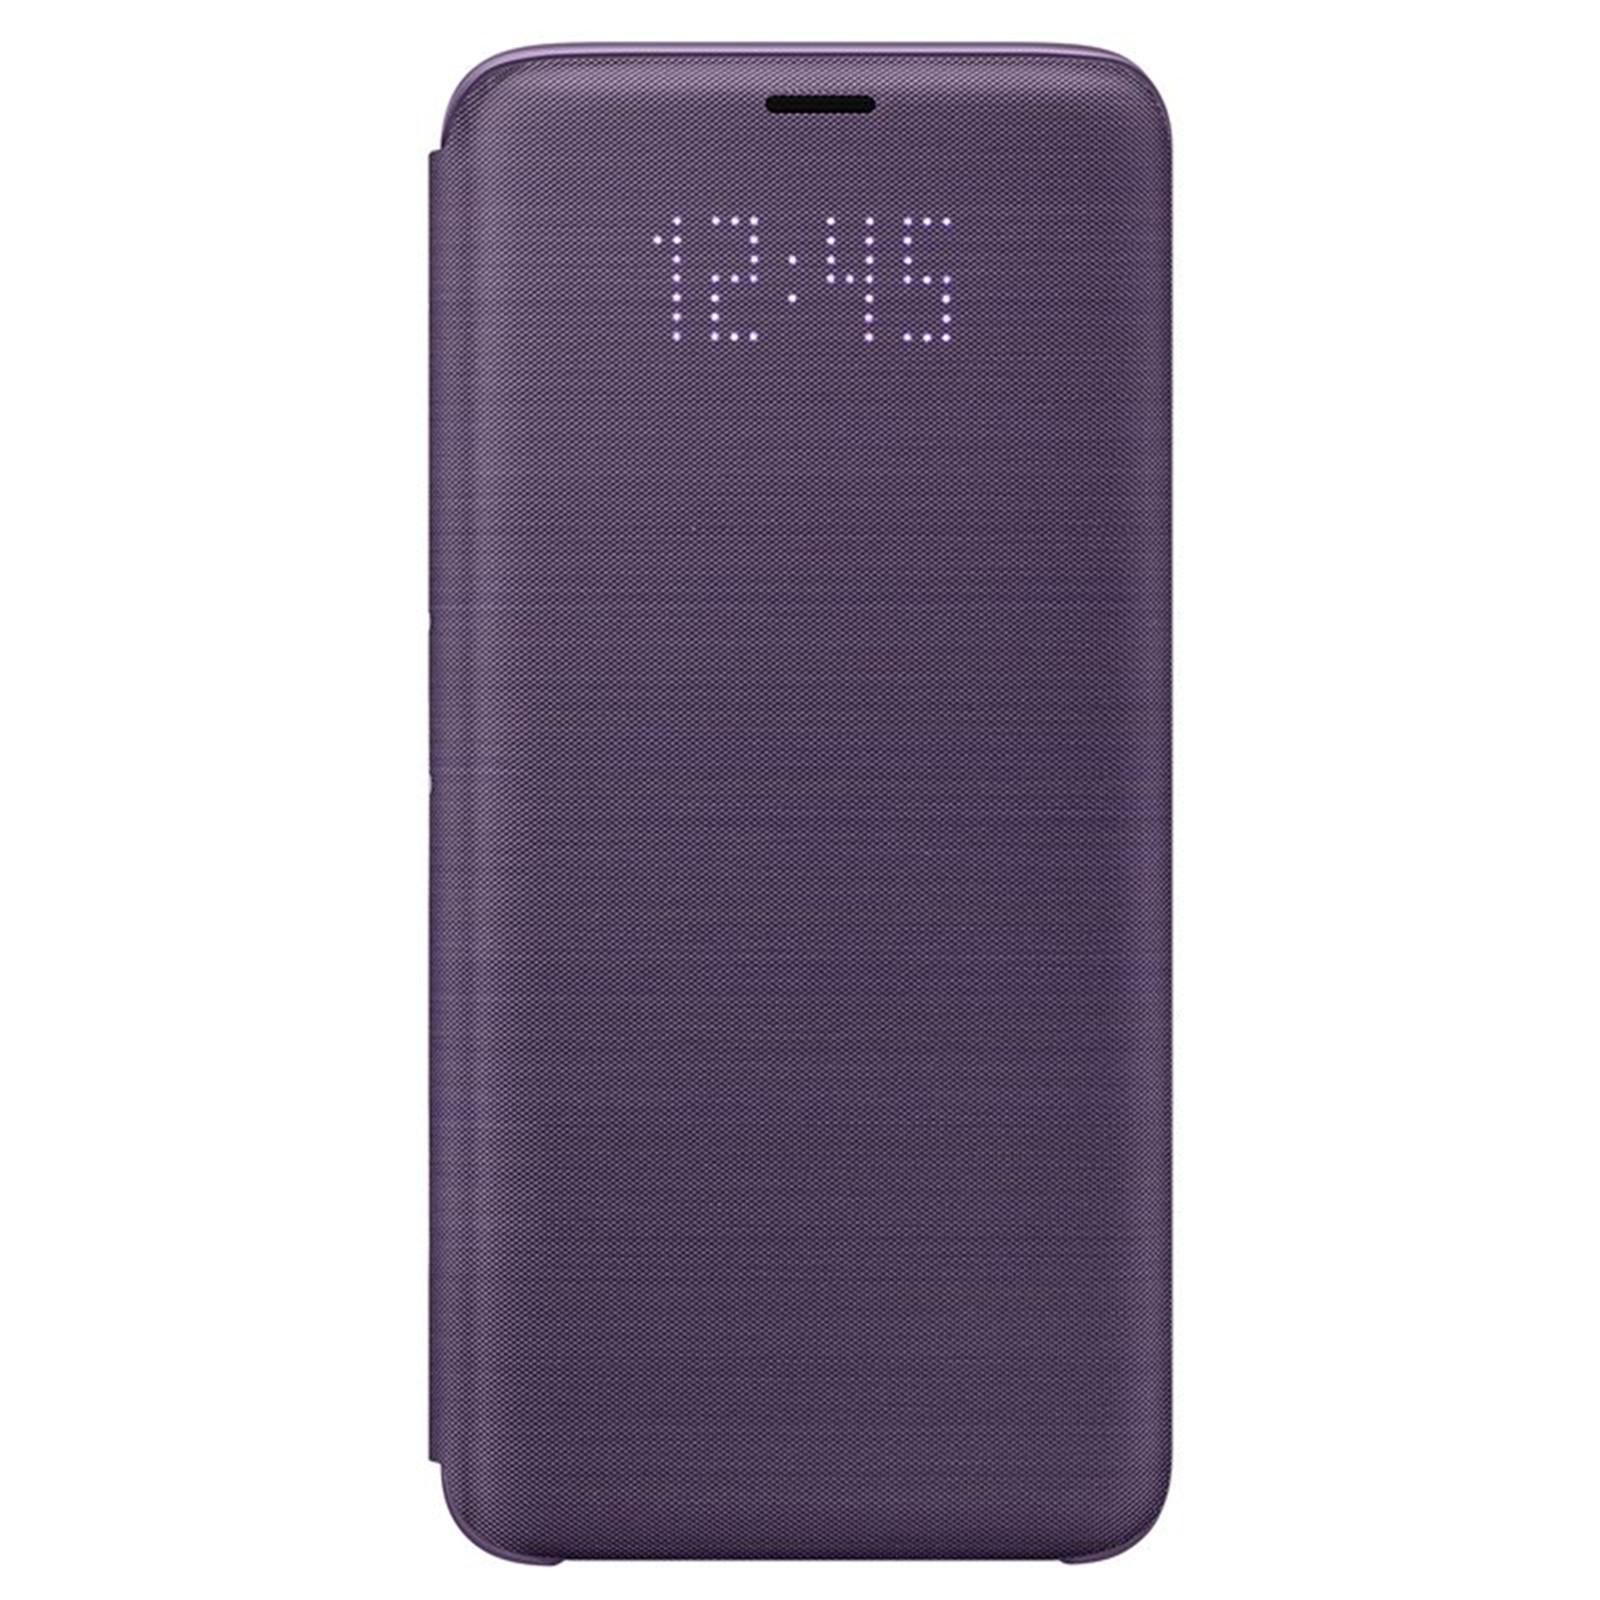 big sale 77f0f d351f Buy the Samsung Galaxy S9 LED View Flip Cover- Purple,Light Alerts ...